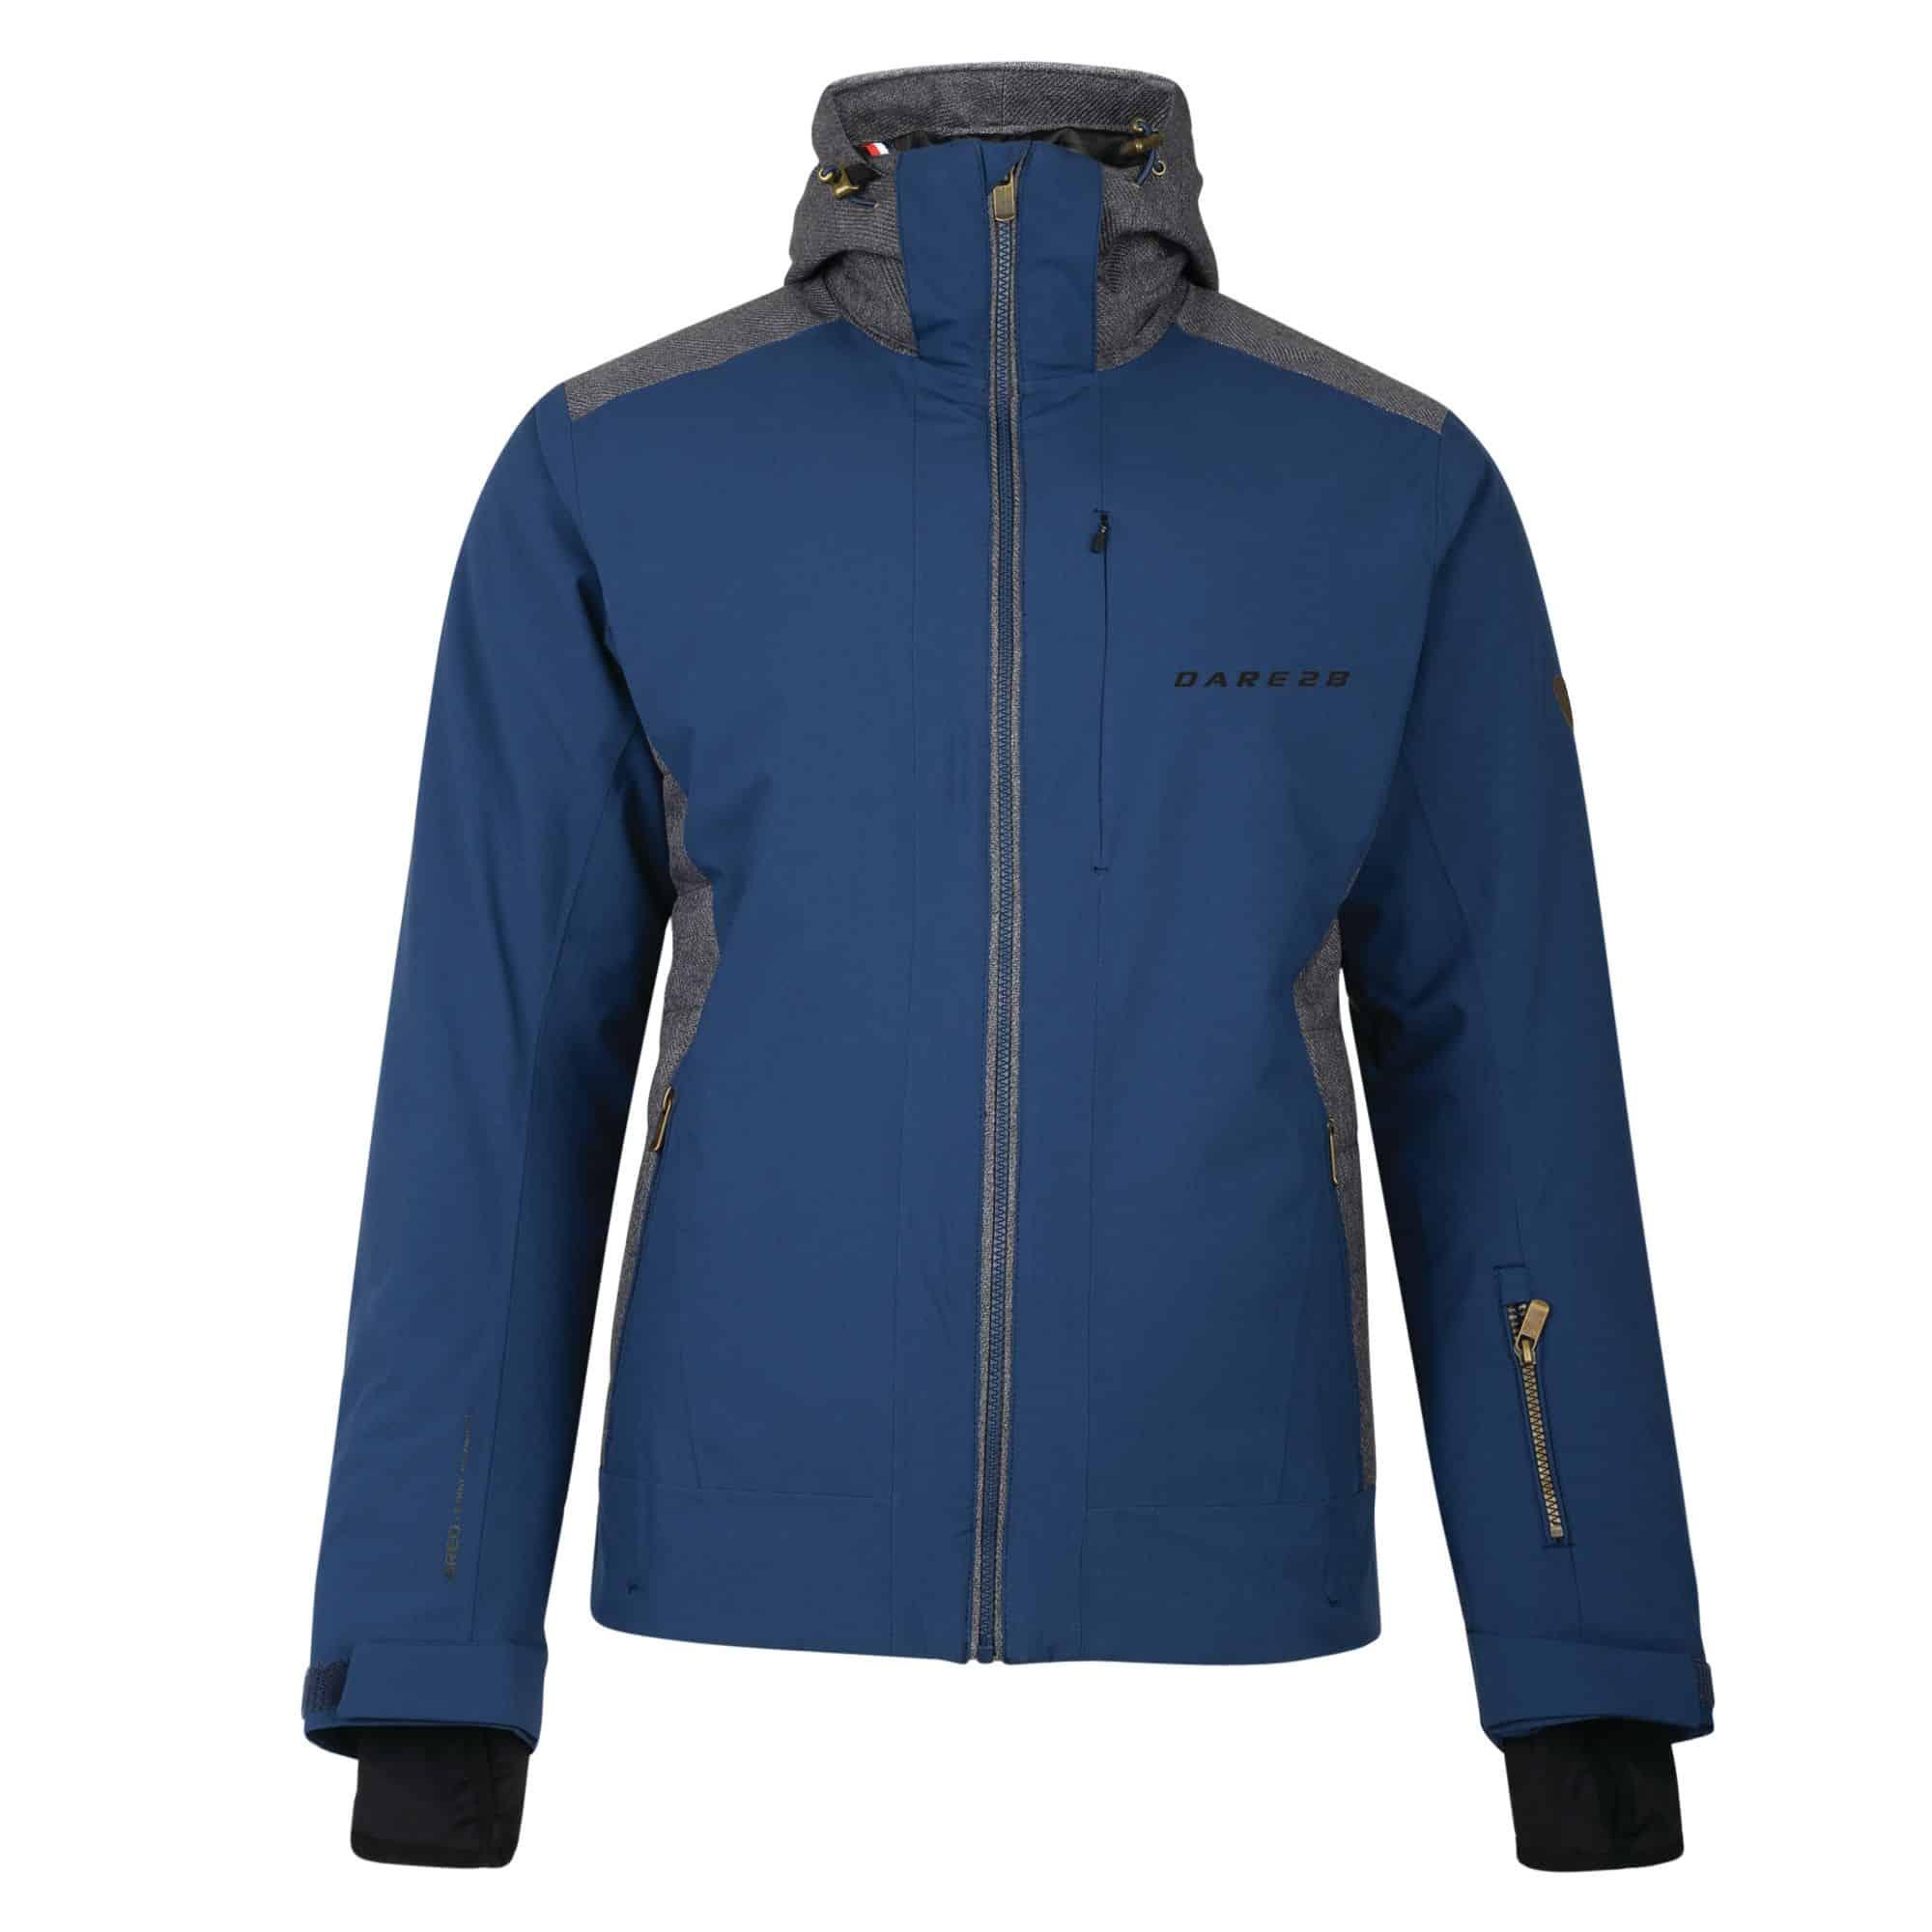 rendition 1718 jacket blue front